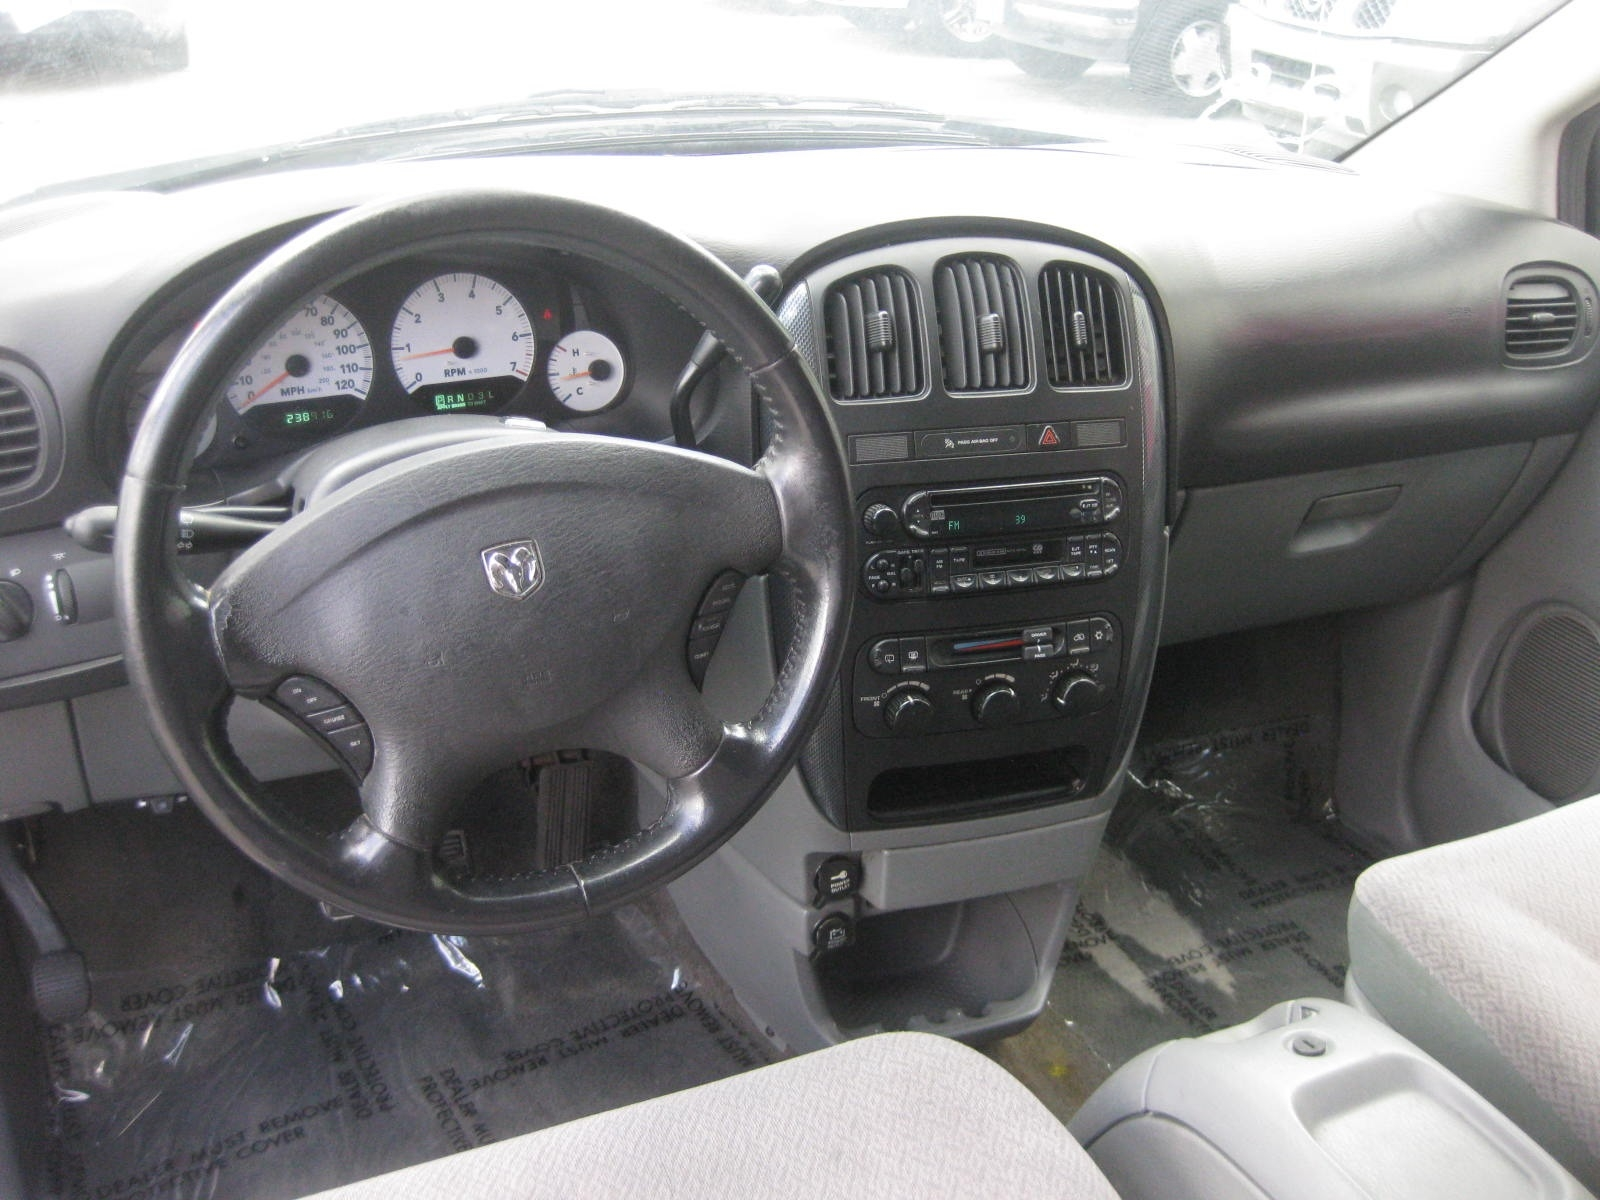 2007 Dodge Grand Caravan 4dr Wgn Sxt Credit Mundo Dealership In Winnetka